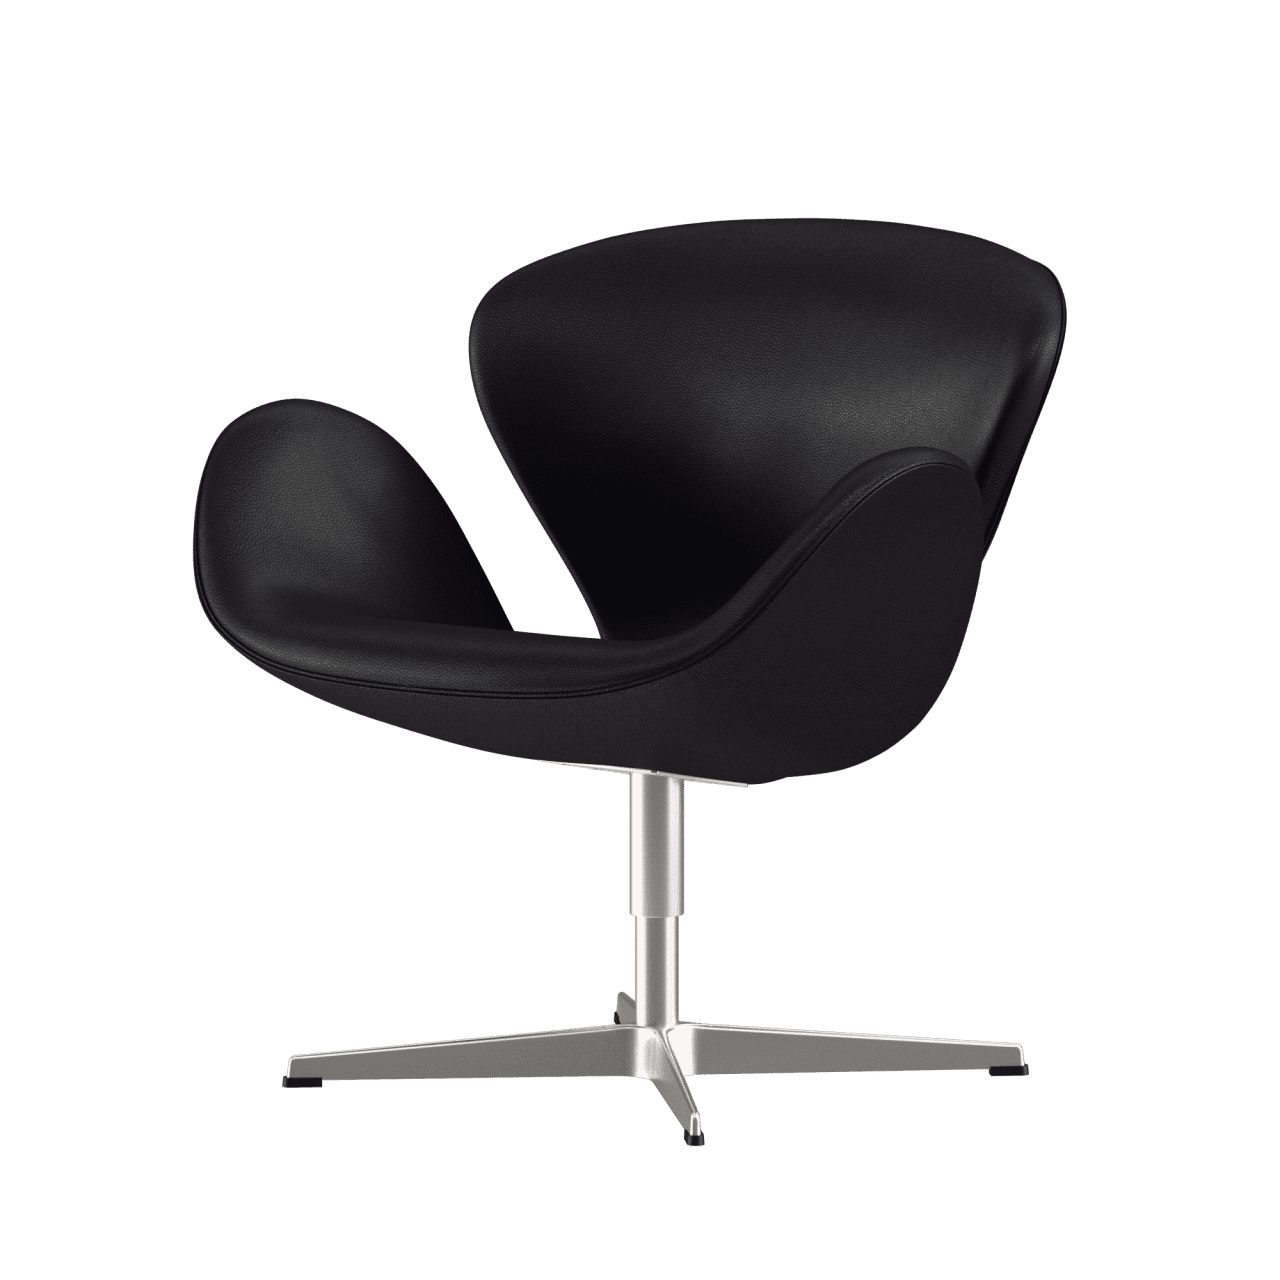 Der Schwan Sessel